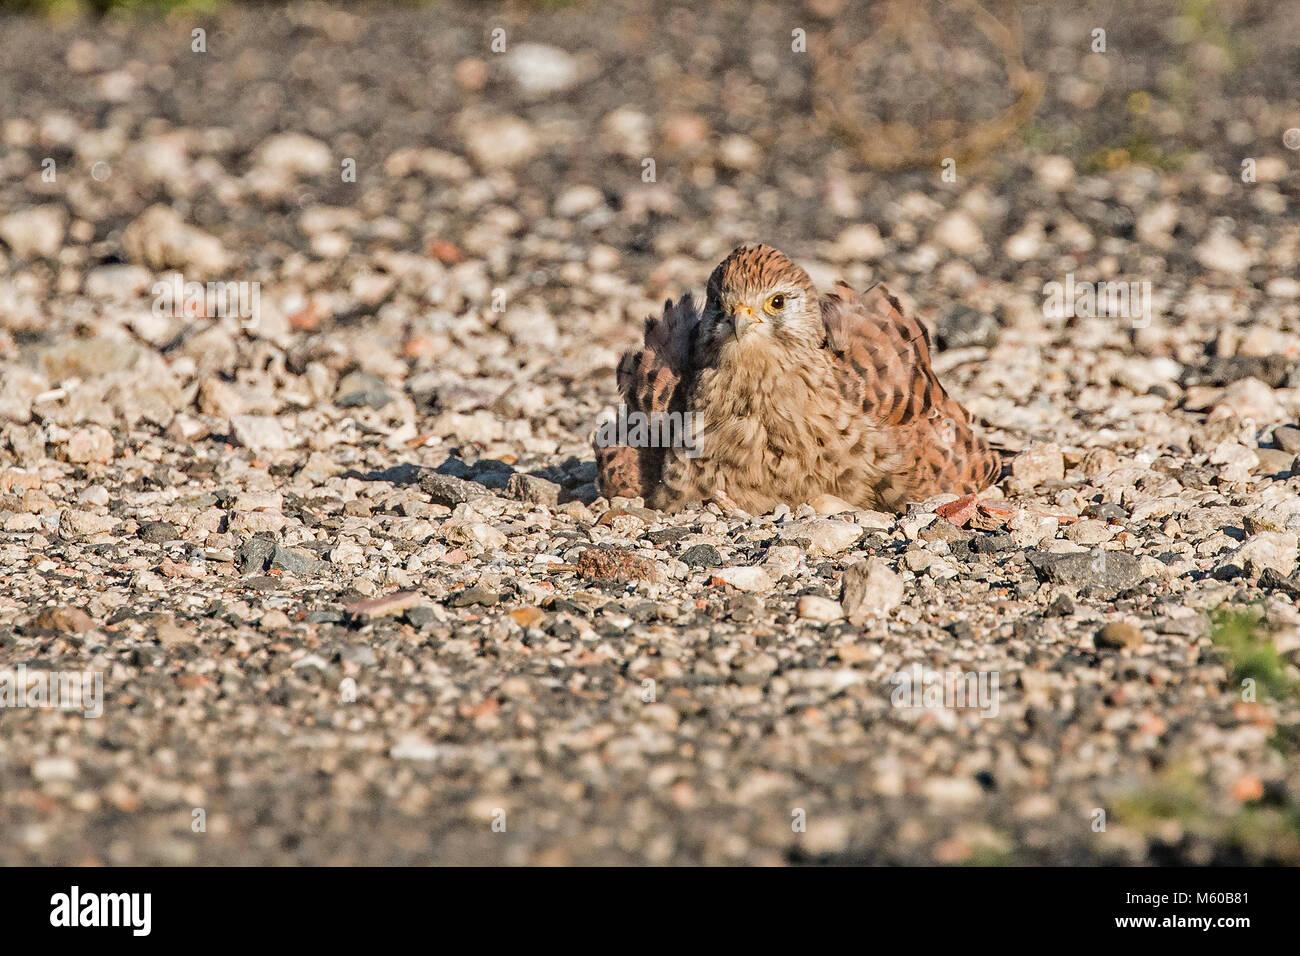 Common Kestrel (Falco tinnunculus). Female taking a sandbath. Germany.. - Stock Image